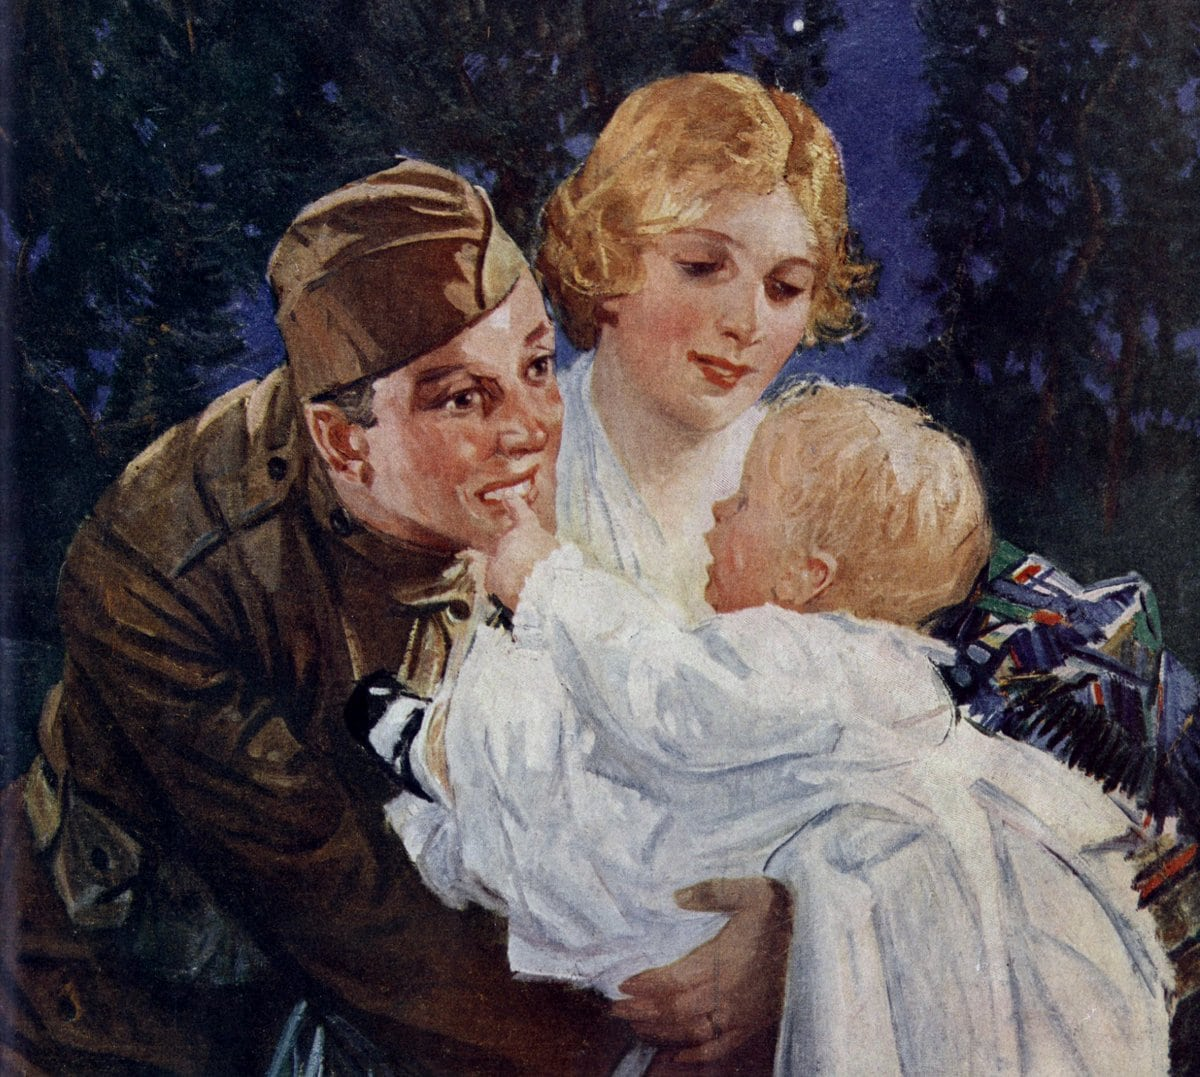 WWI dad baby war